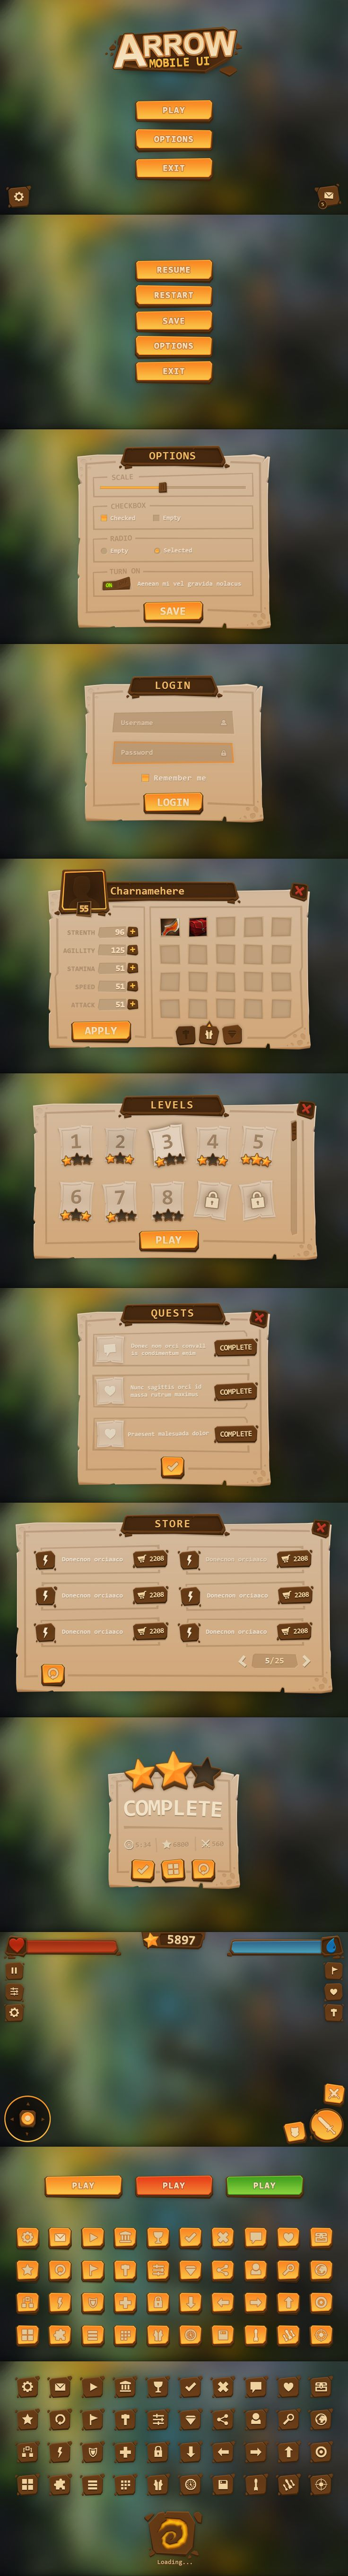 Arrow Mobile UI